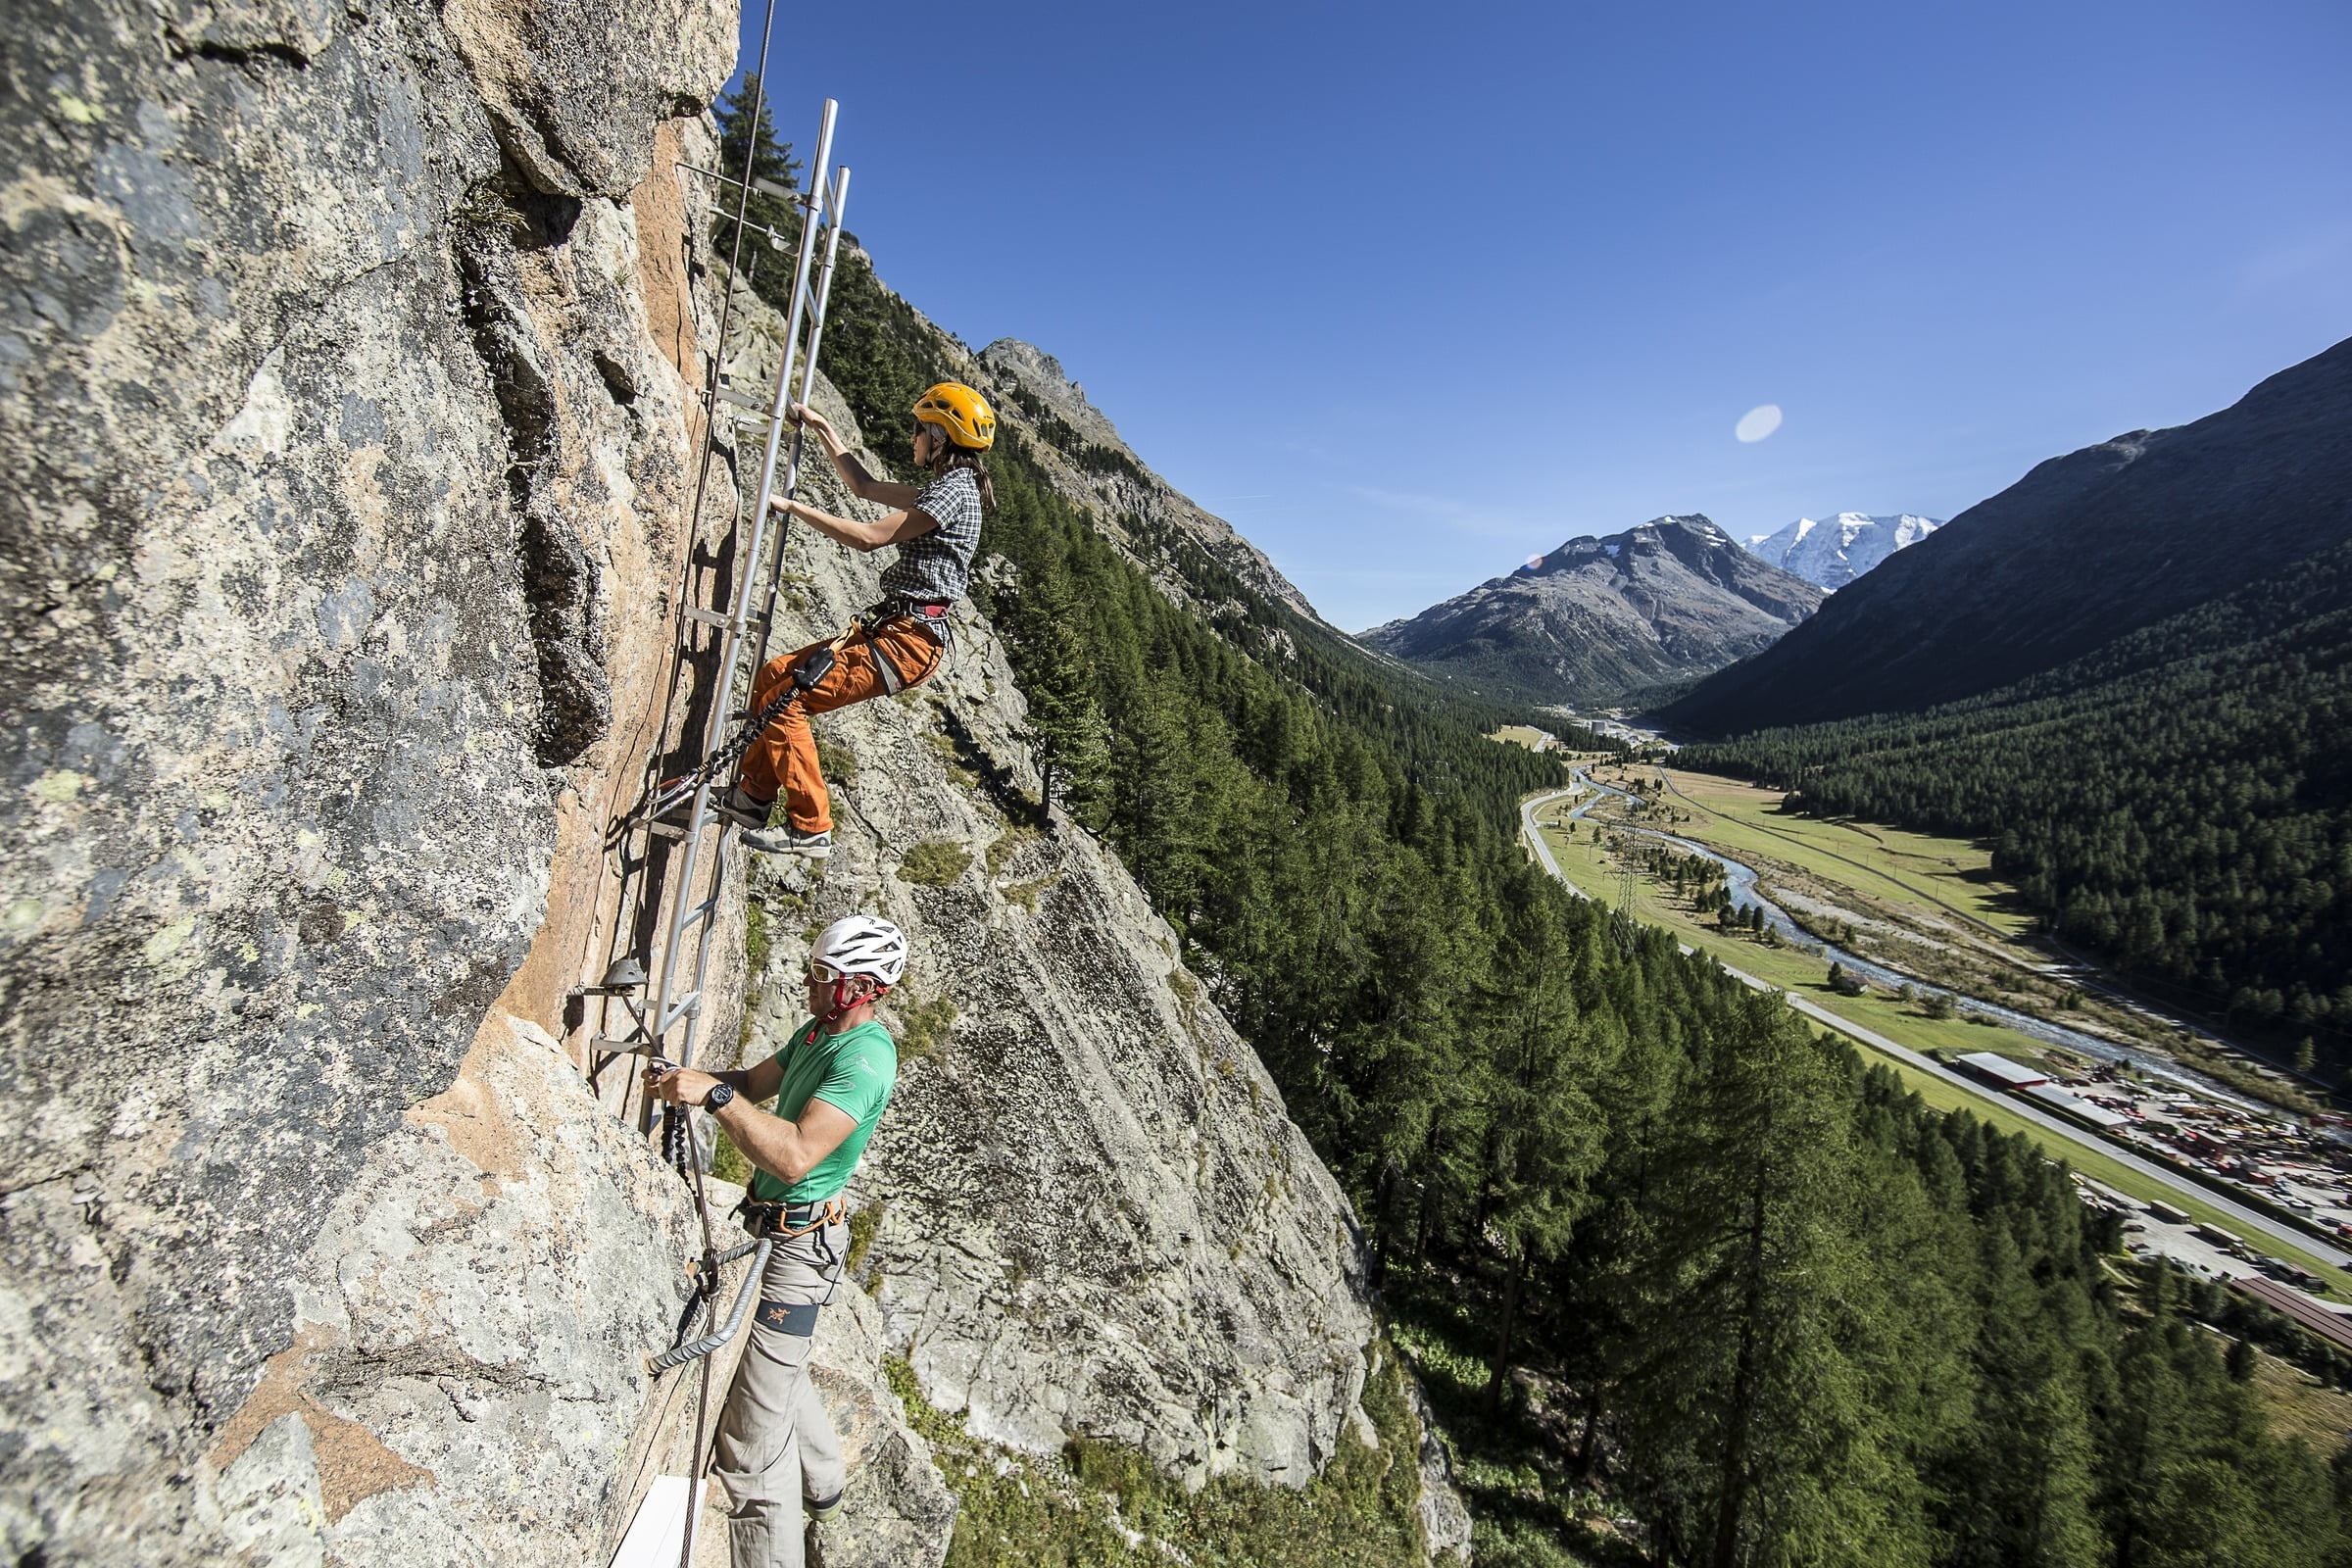 Klettergarten am Morteratsch